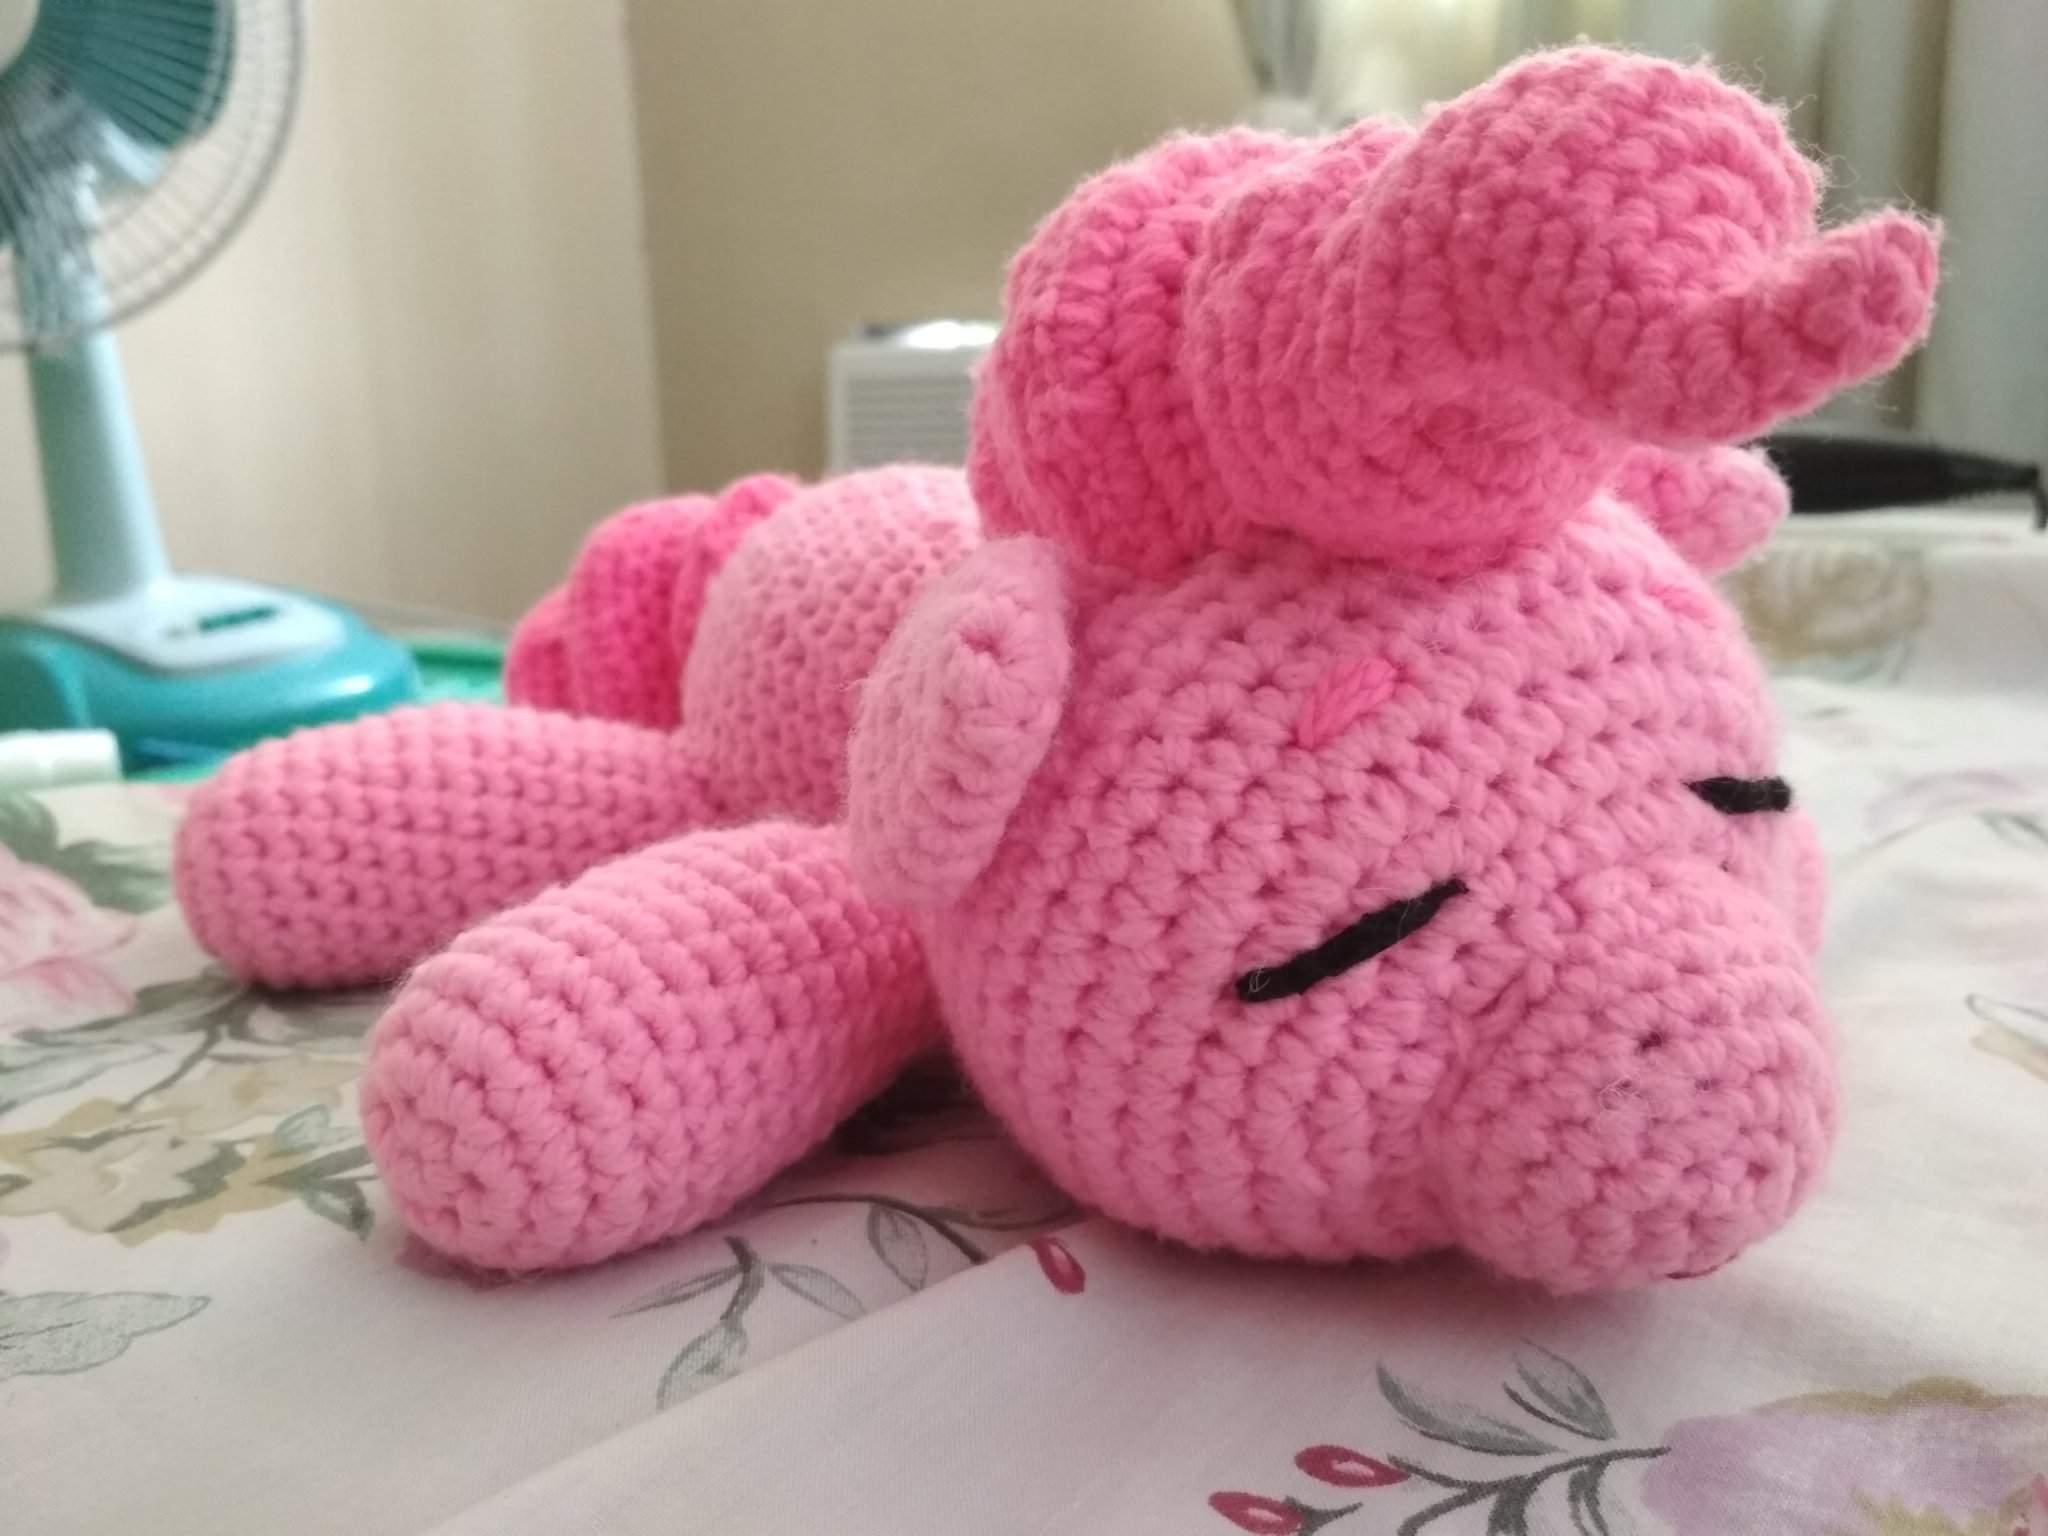 Sleeping unicorn pony crochet pattern | Crochet unicorn pattern ... | 1536x2048